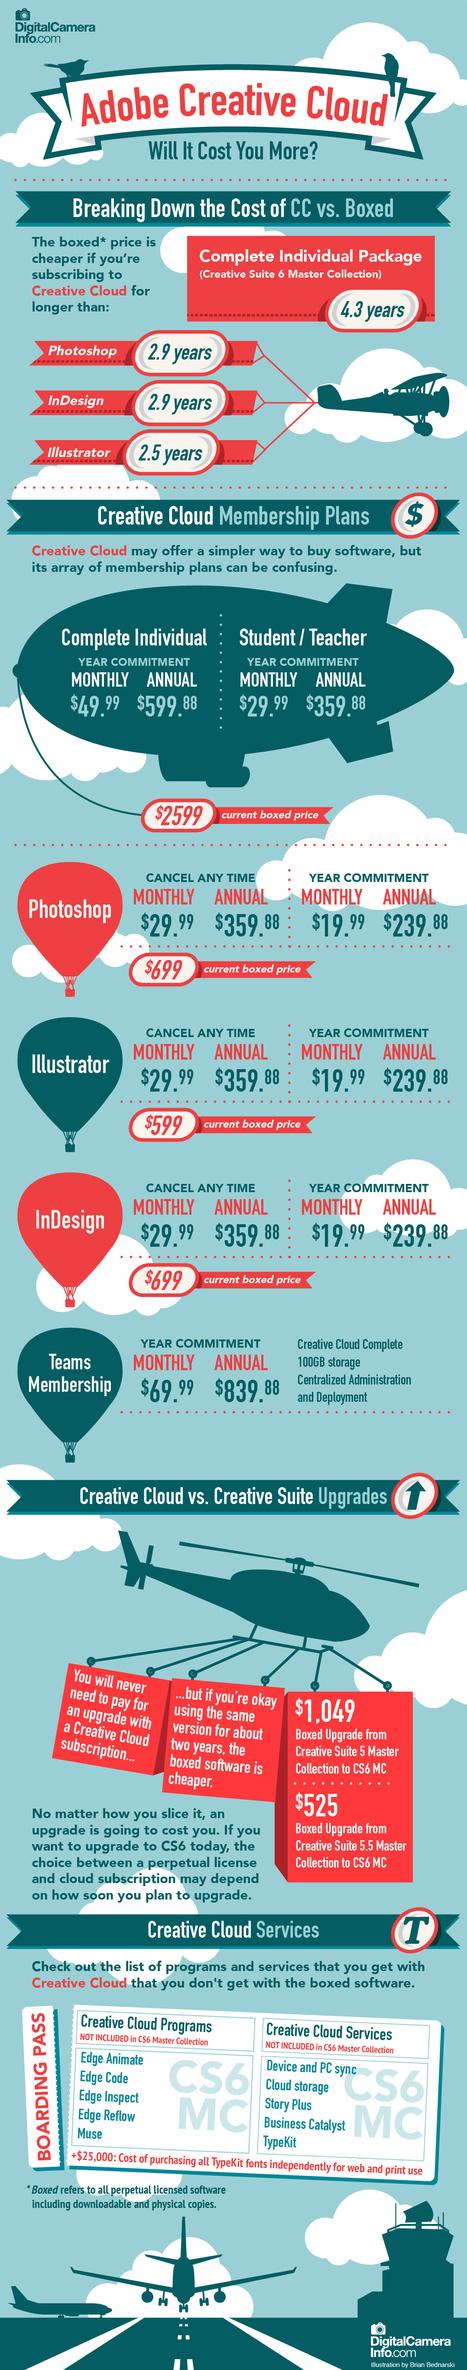 Infographic: Will Adobe Creative Cloud Help or Hurt You? - DigitalCameraInfo.com | Design Goodness | Scoop.it